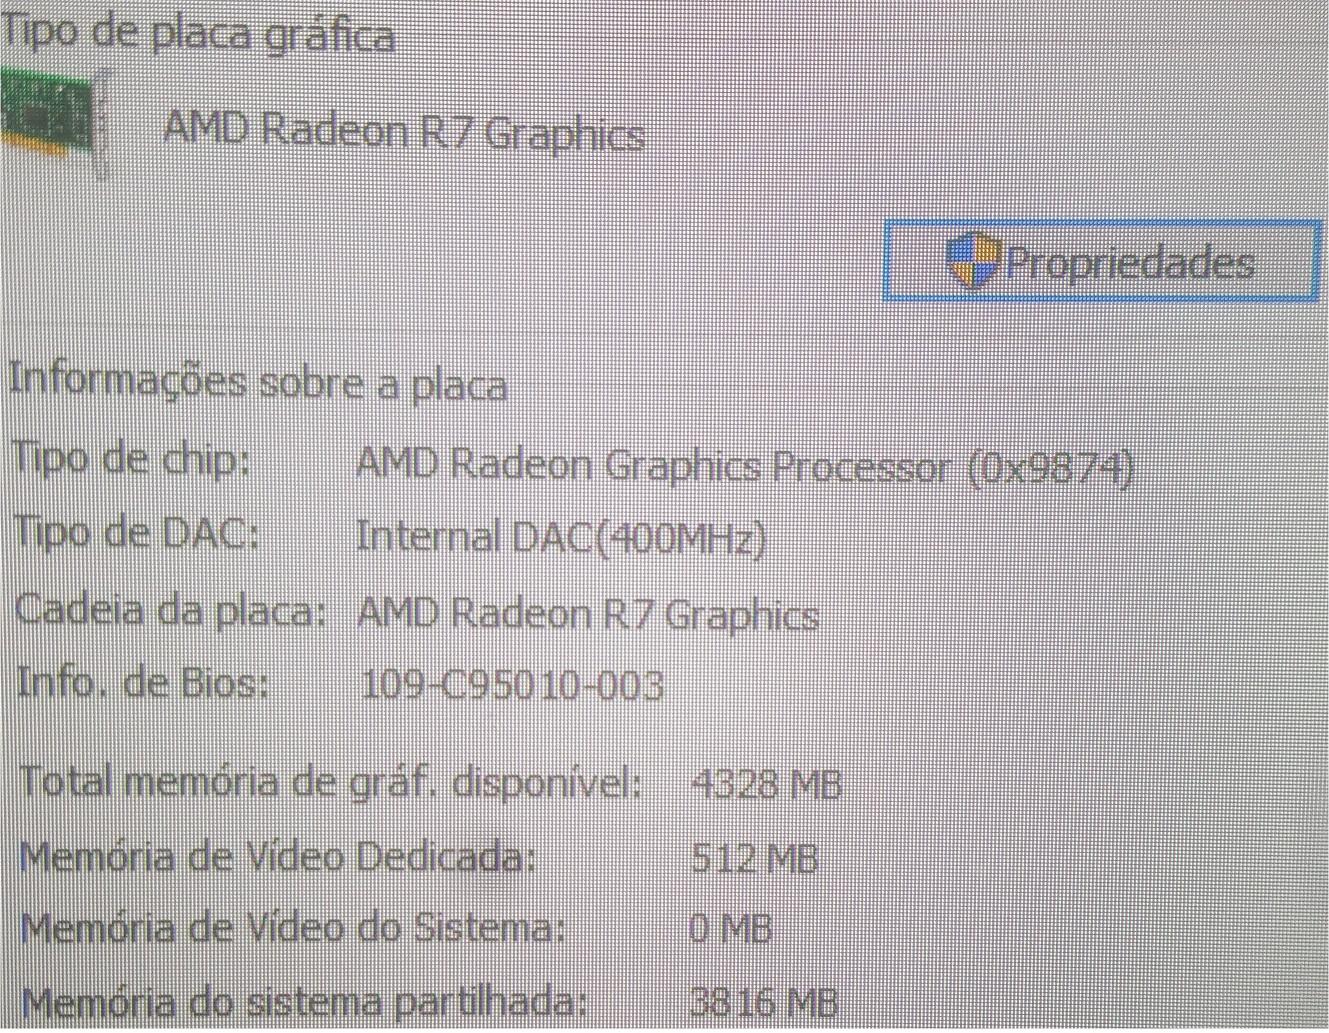 radeon r7 370 driver windows 10 64 bit